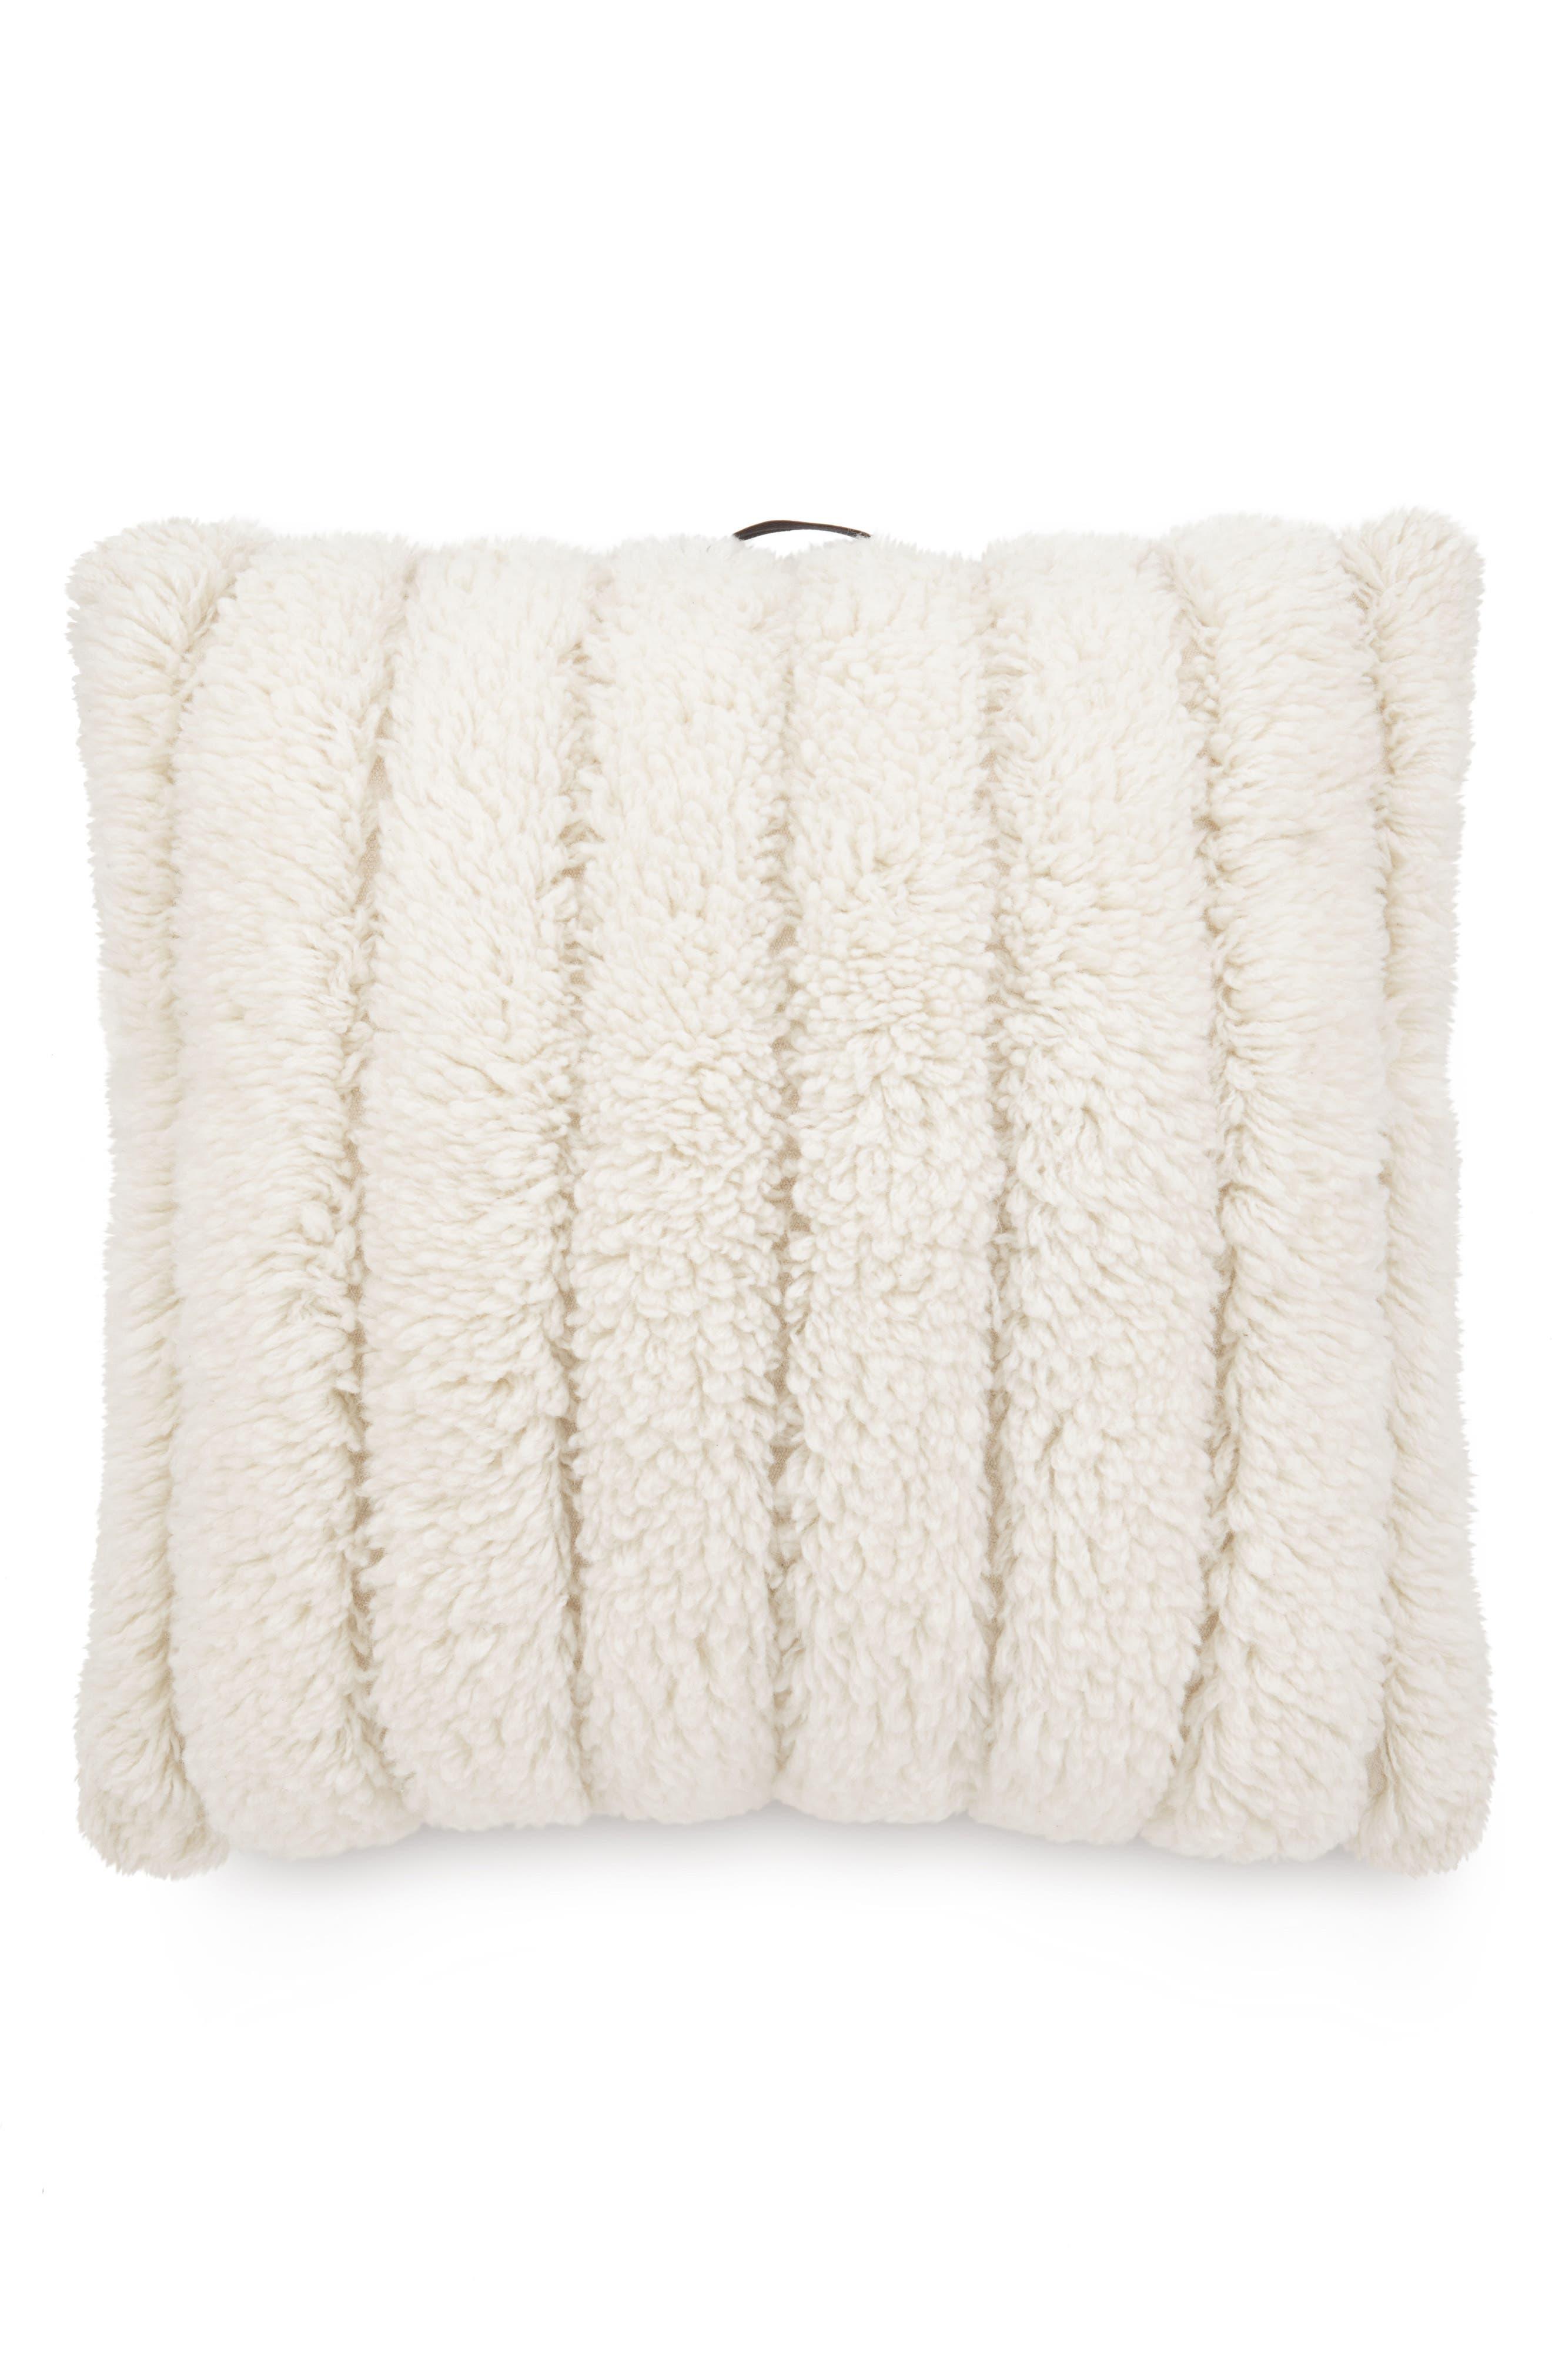 Tufty Yarn Pillow,                         Main,                         color, 250